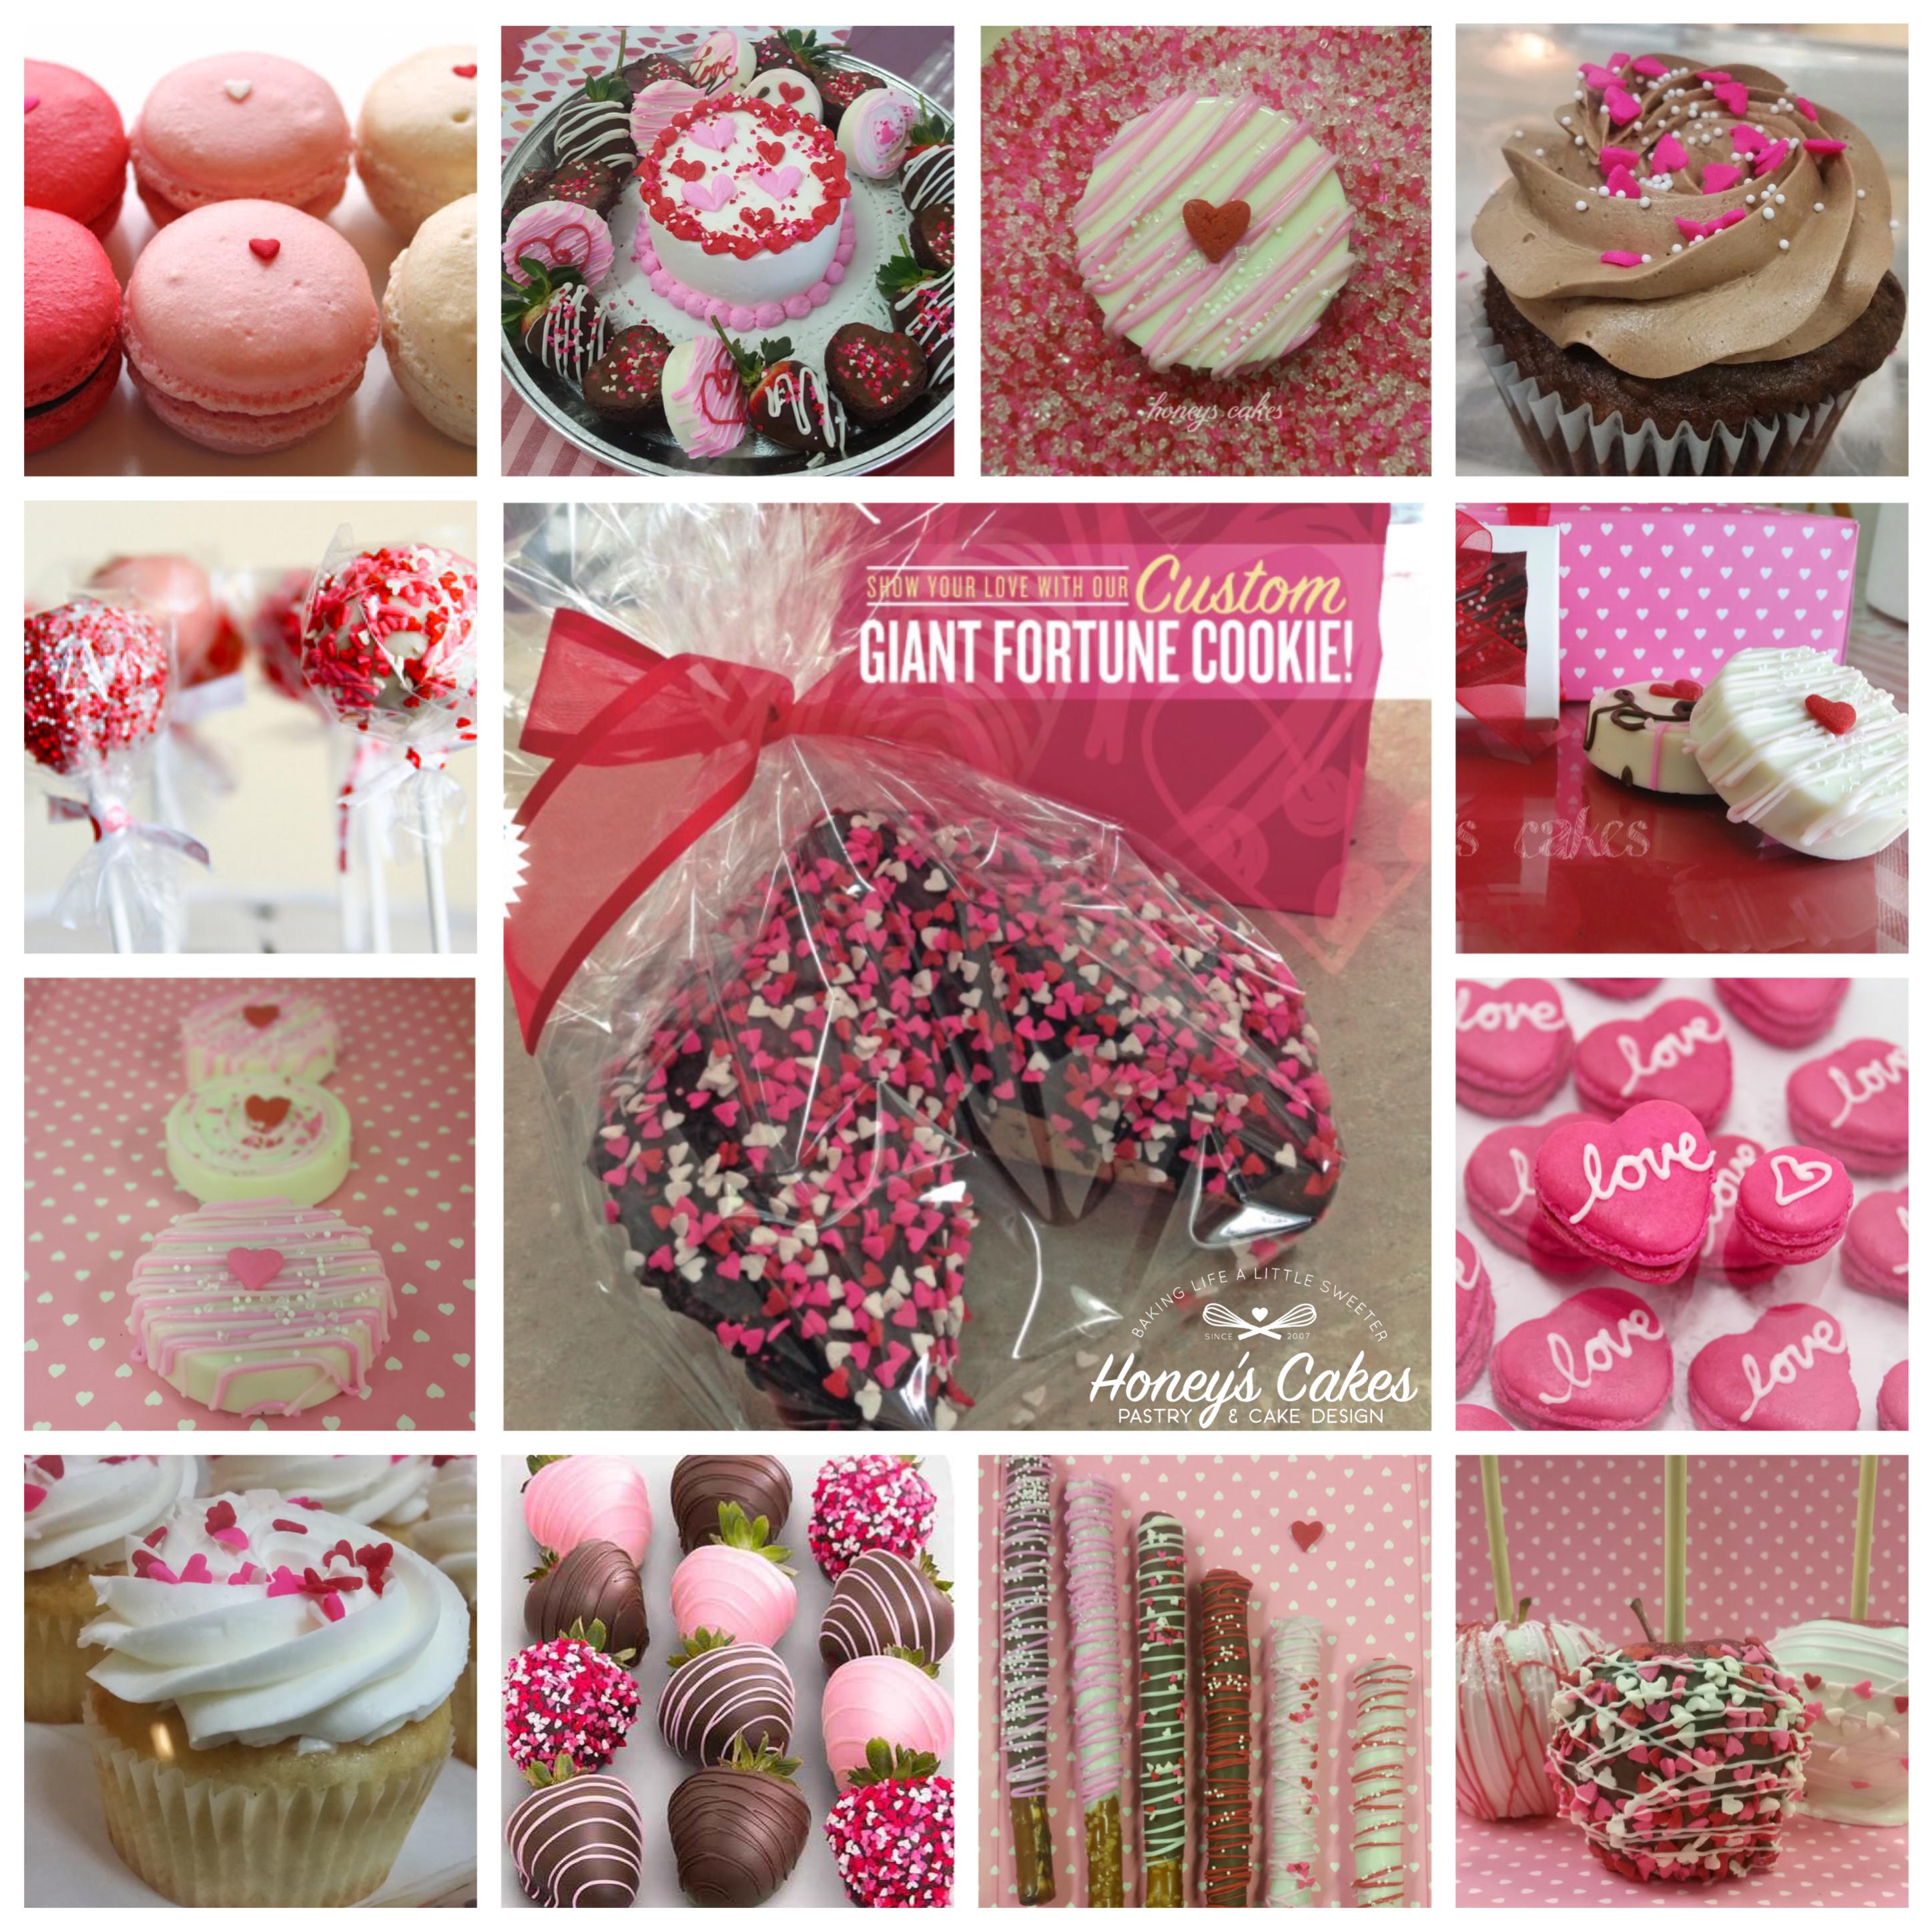 Giant Fortune Cookies | Honey\'s Cakes